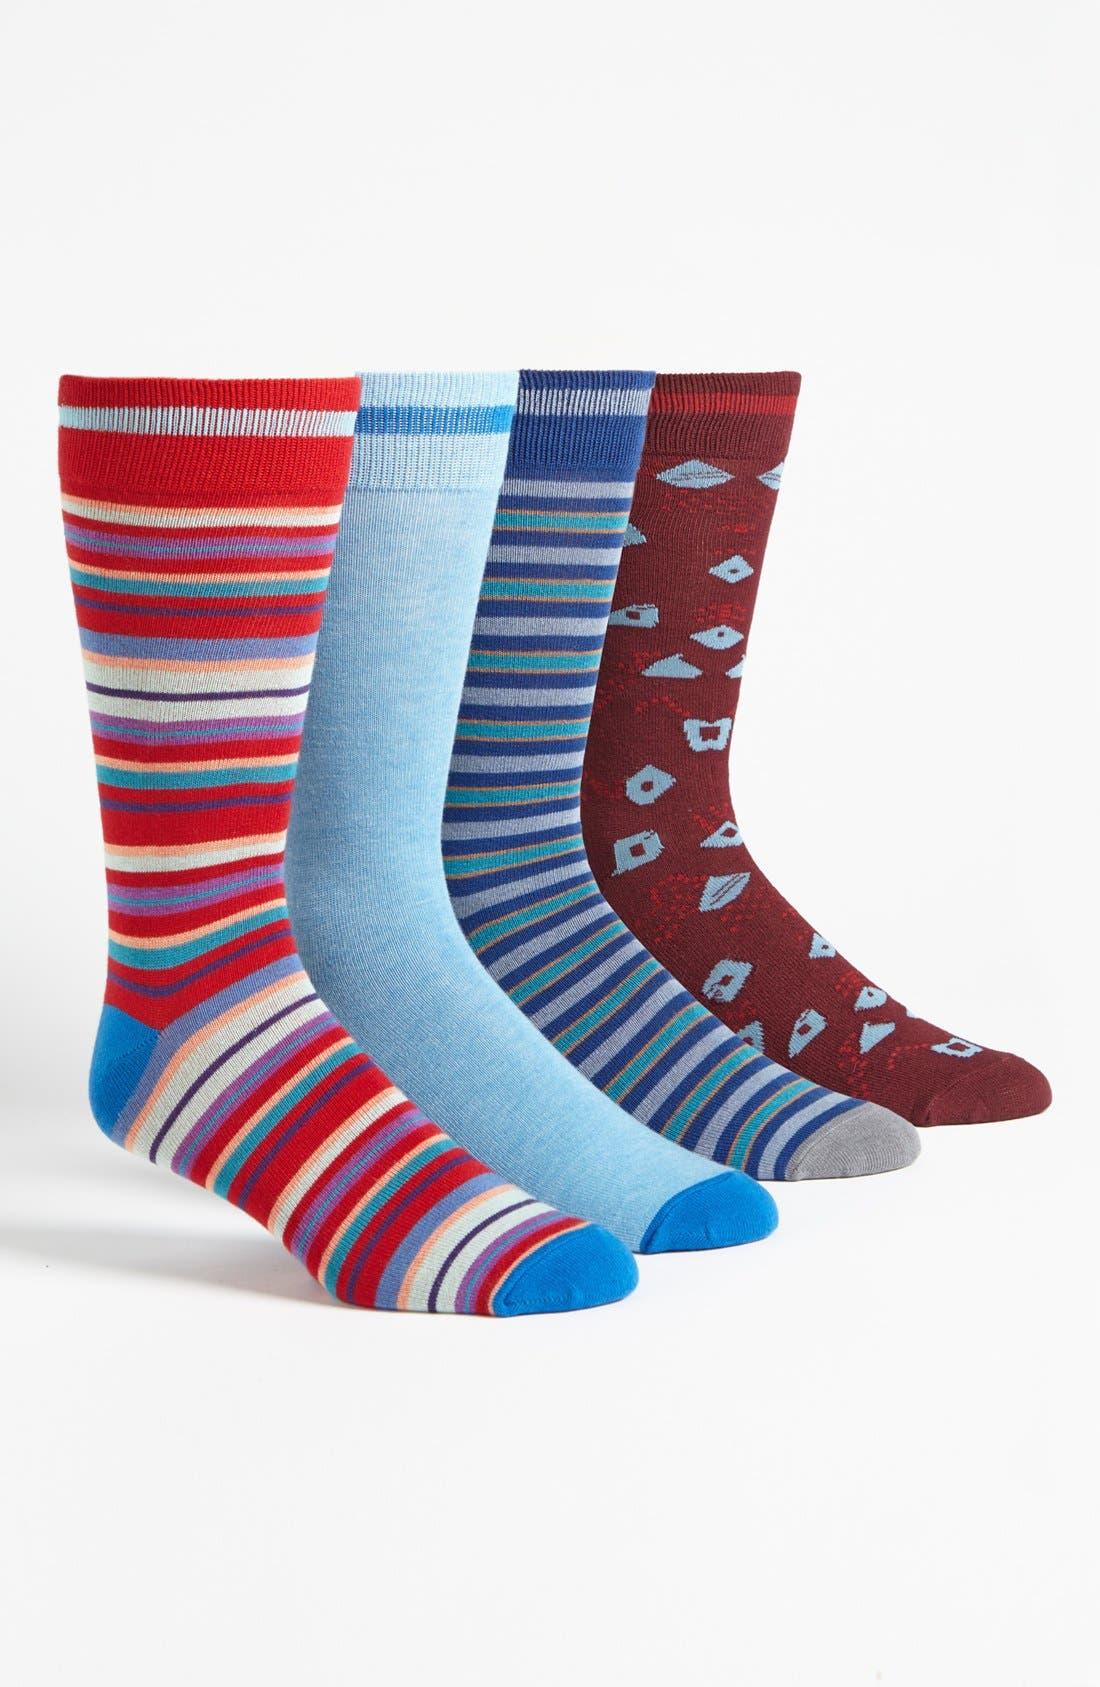 Main Image - Basic Sock 'Bottoms Out' Pattern Socks (4-Pack)